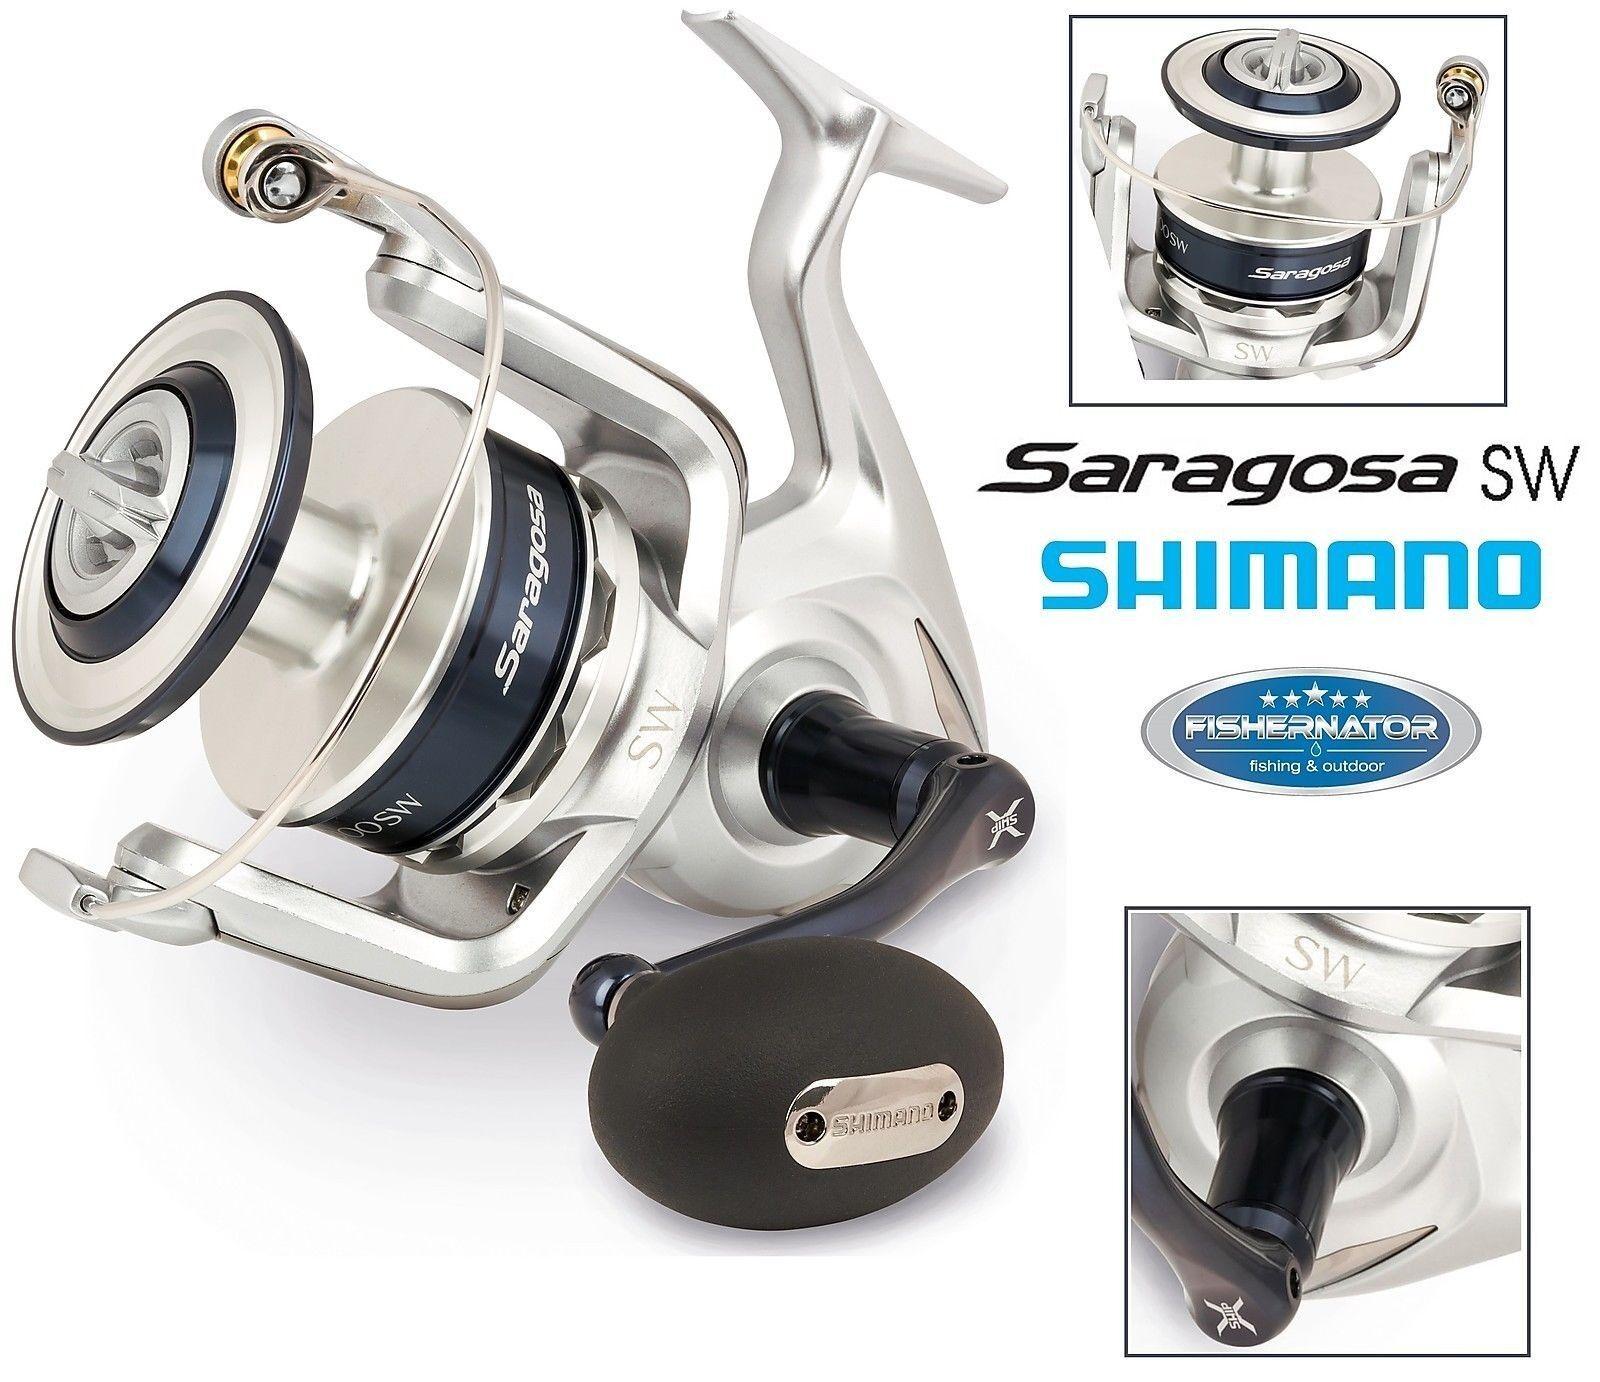 Shimano Saragosa 5000 SW Salzwasser Angelrolle, SRG5000SW